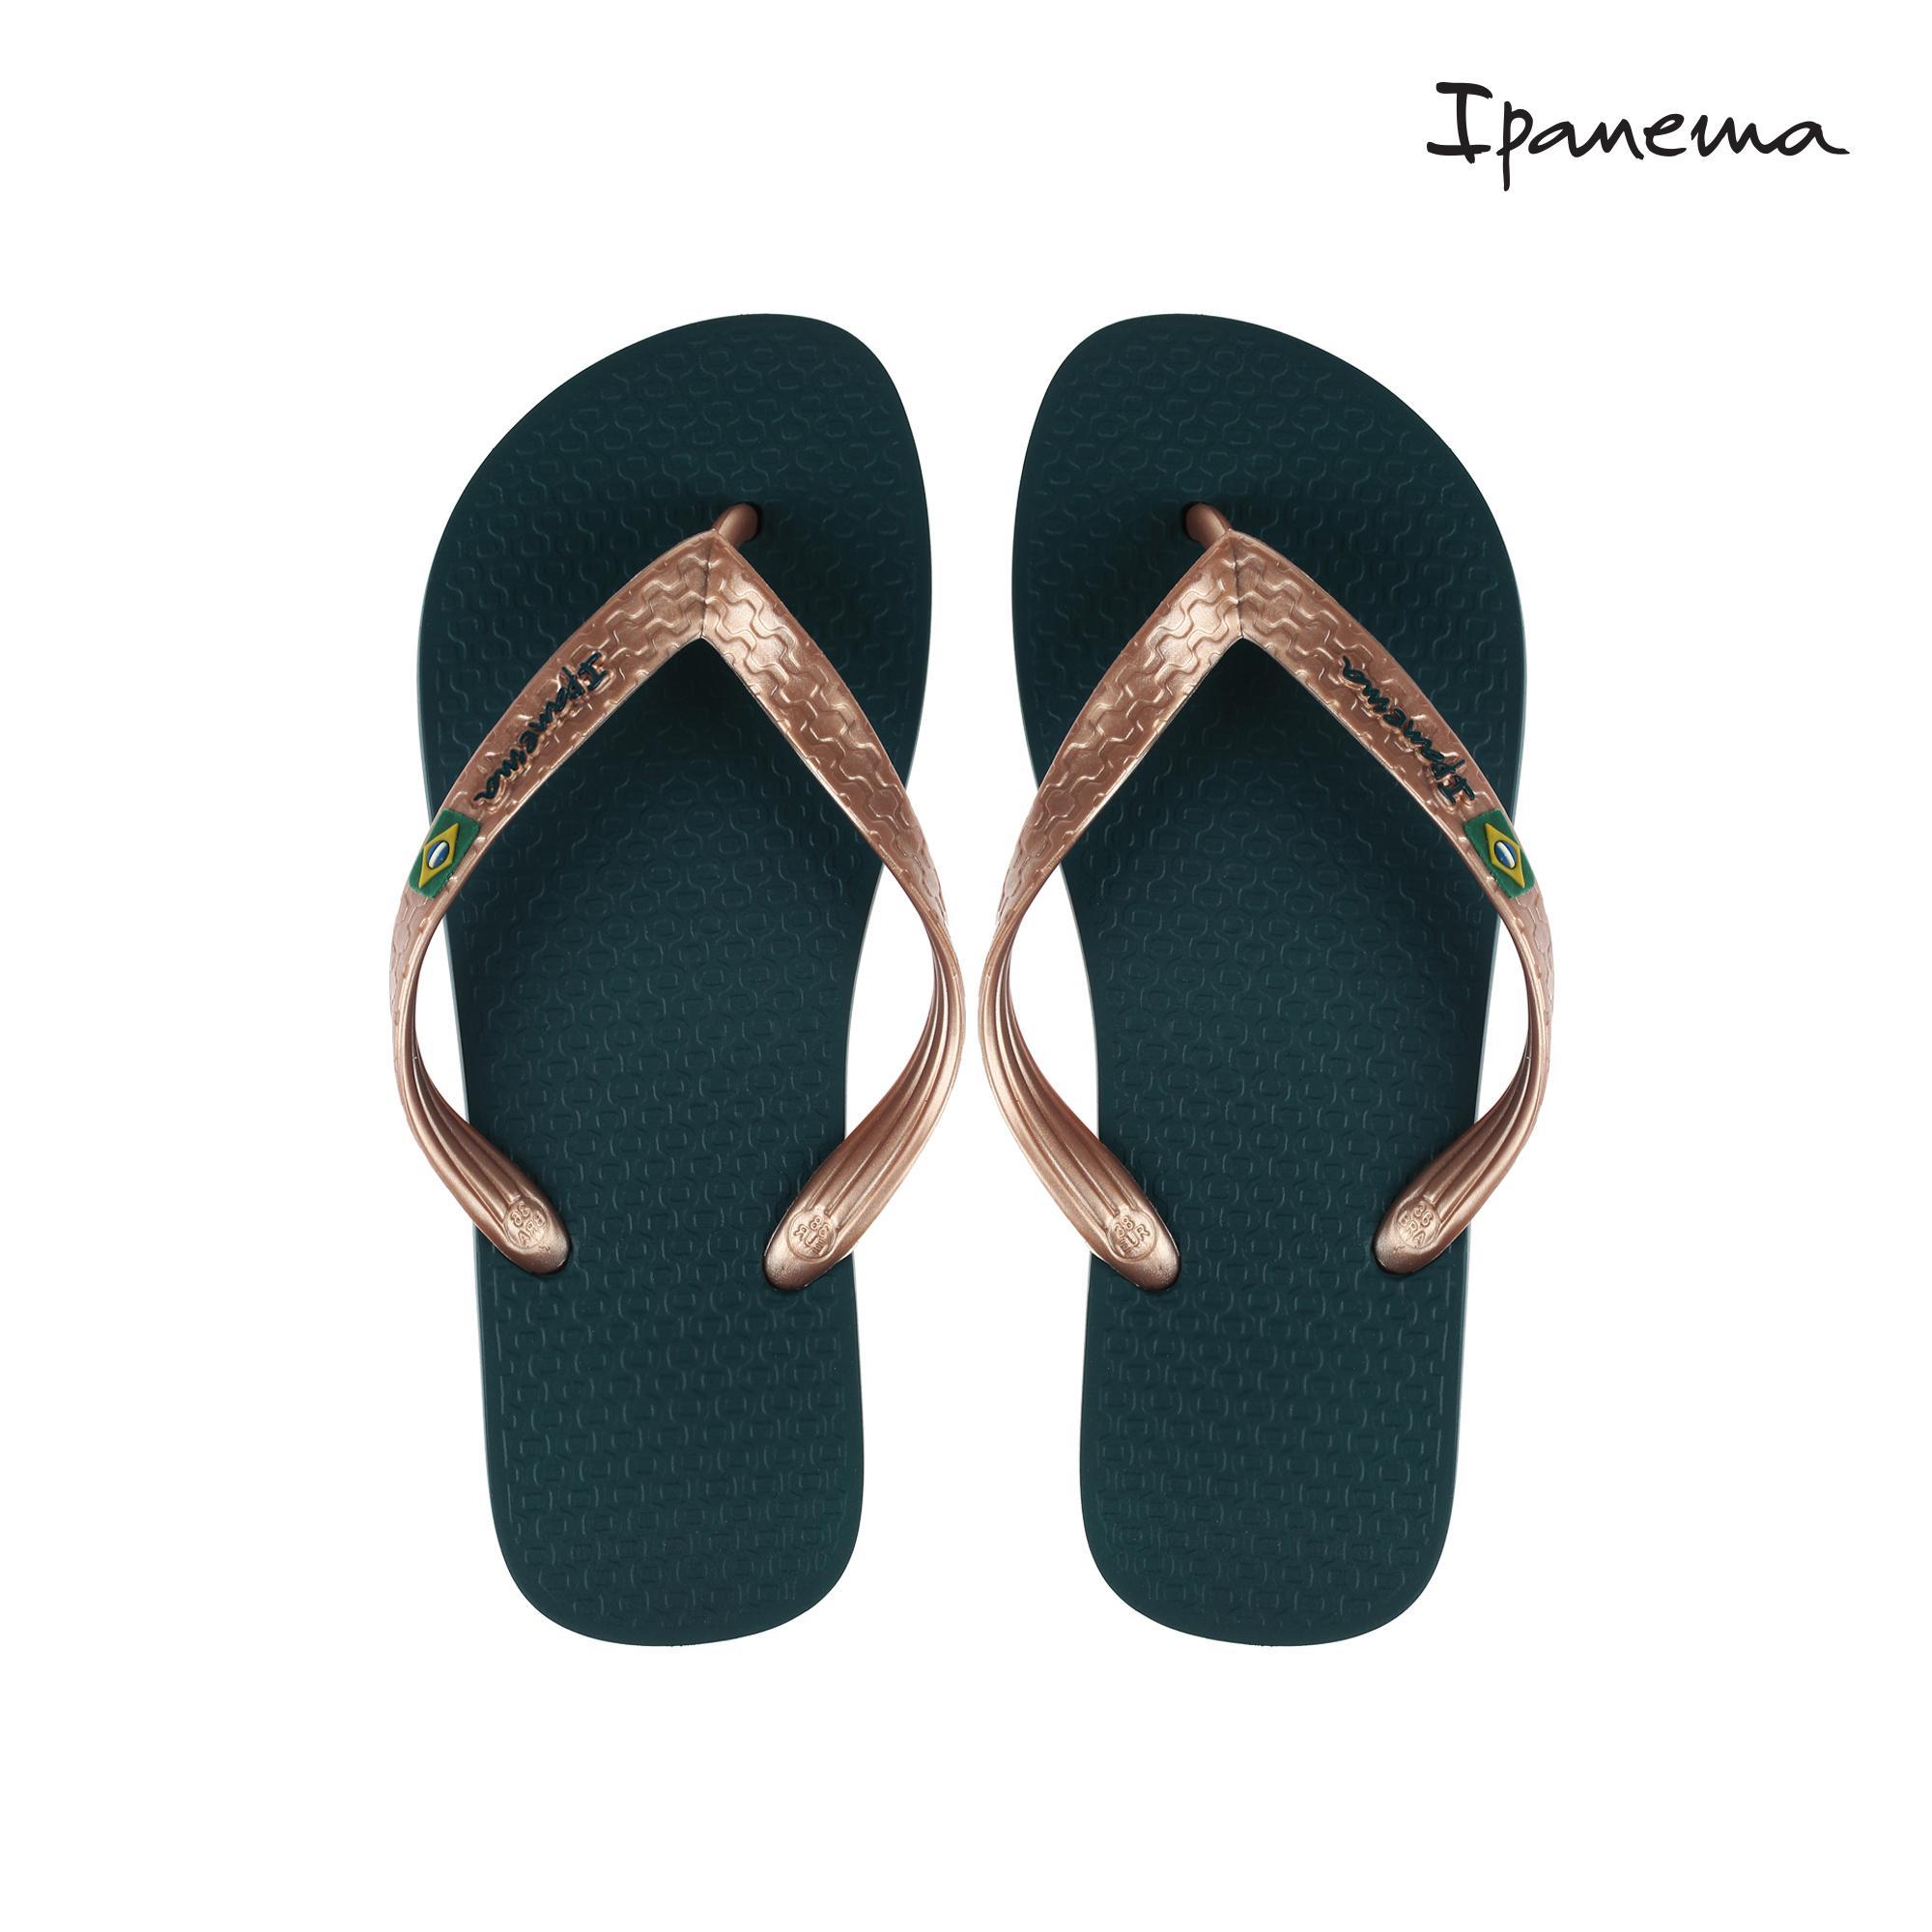 5f1356dc1 Ipanema Philippines  Ipanema price list - Ipanema Flip Flop ...